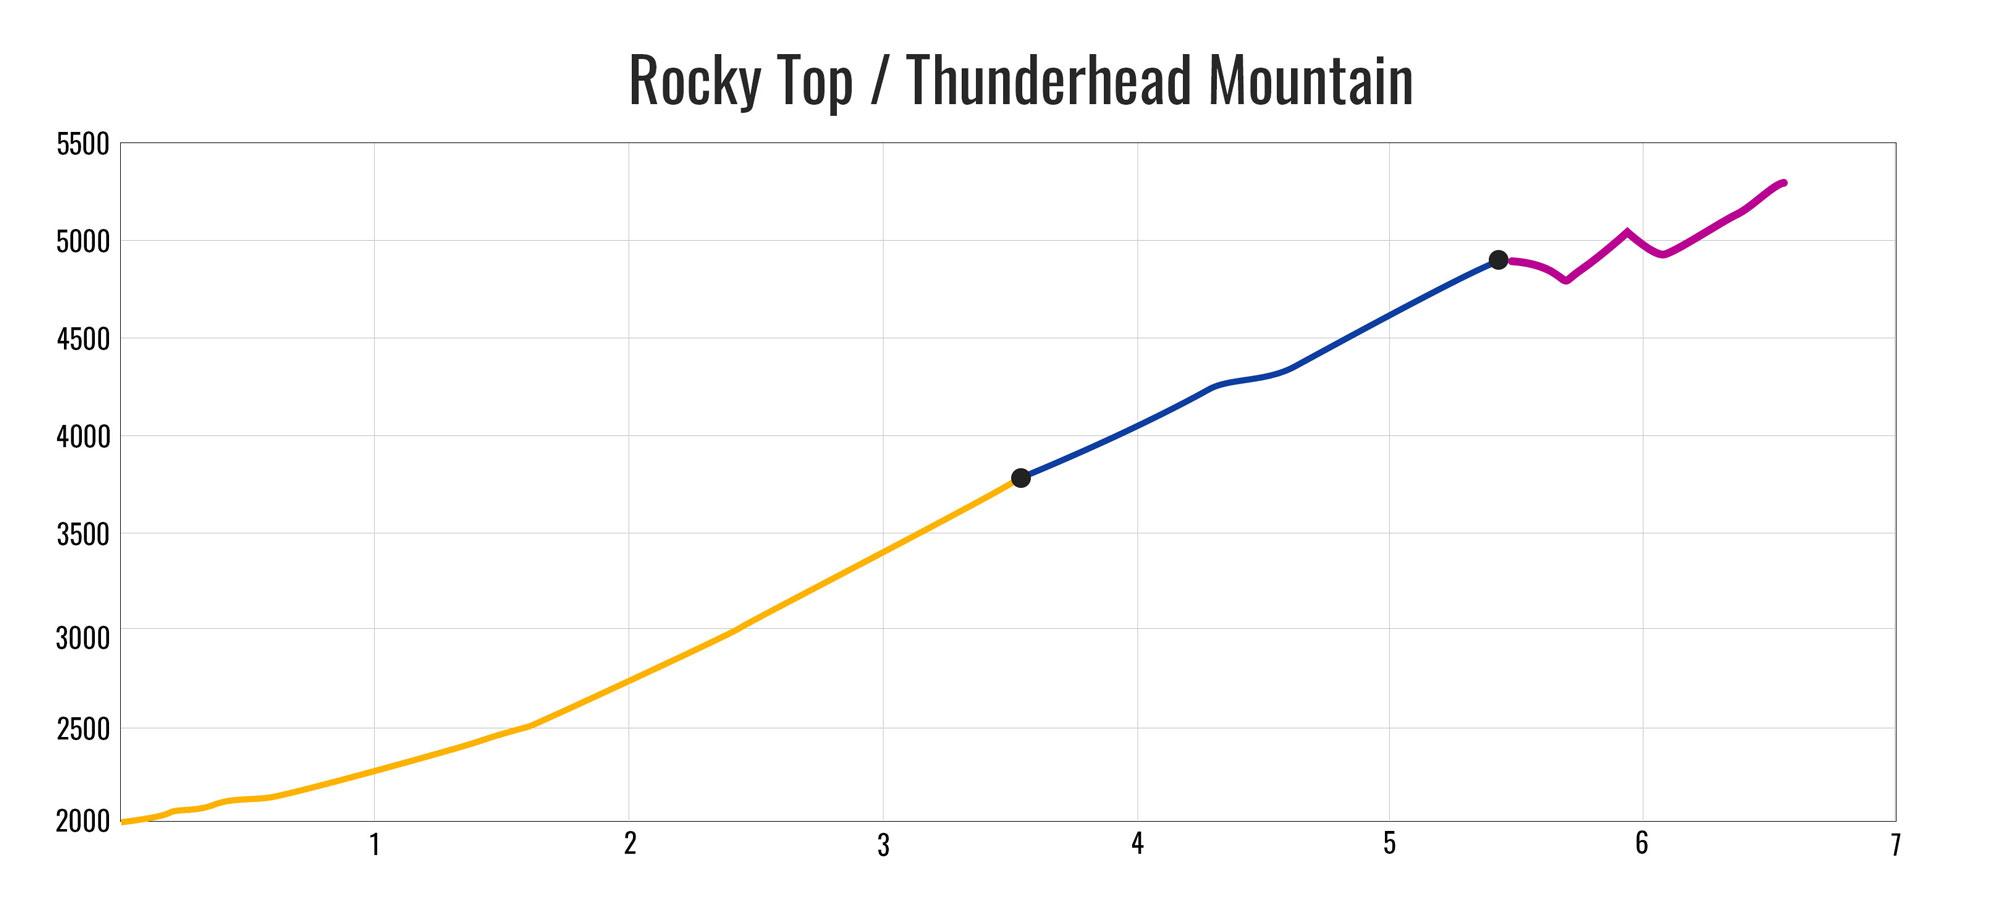 Thunderhead Mountain (Rocky Top) Elevation Profile